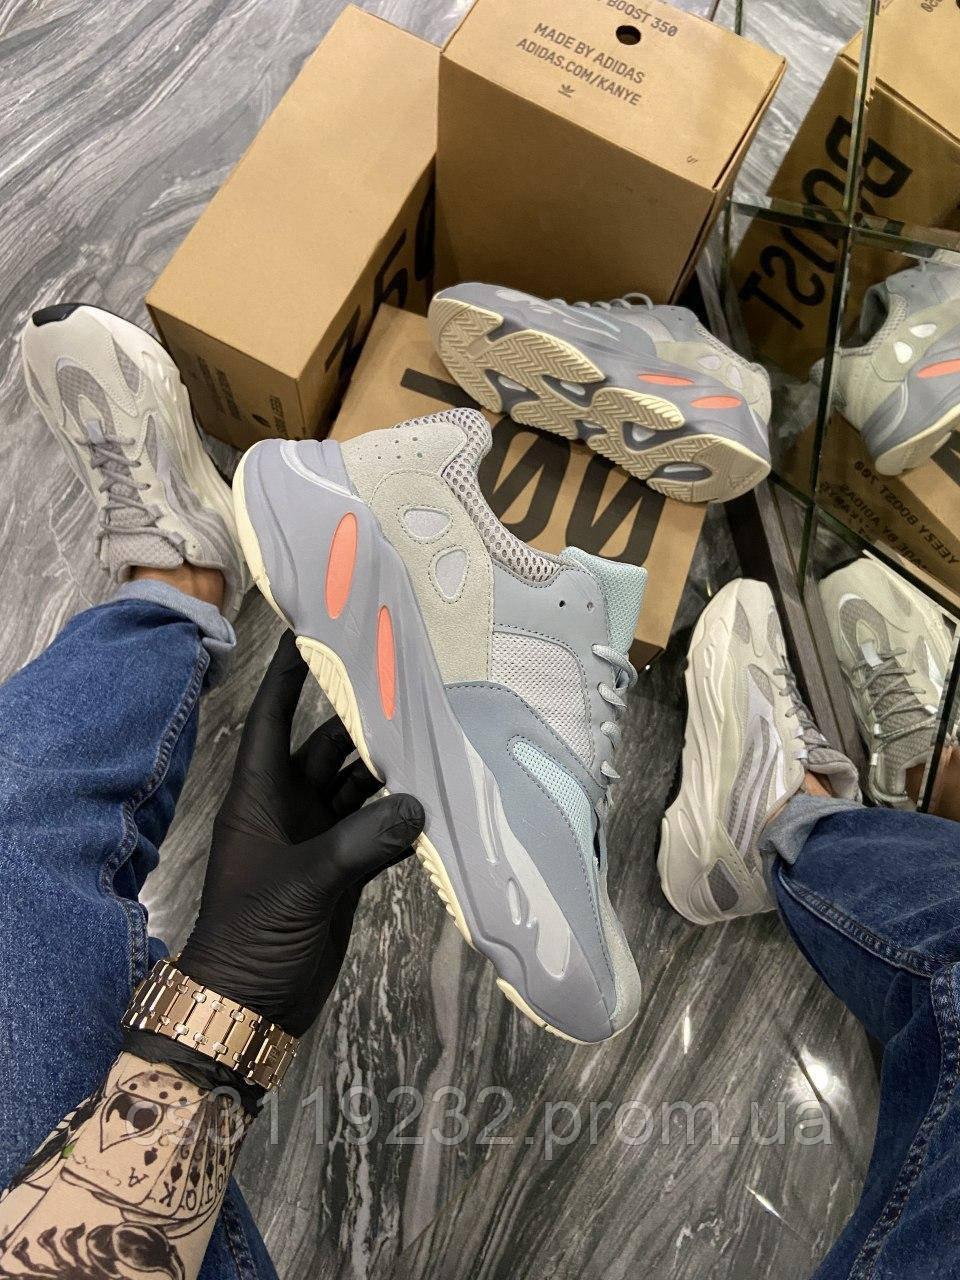 Мужские кроссовки Adidas Yeezy Boost Wave Runner 700 Inertia (серые)